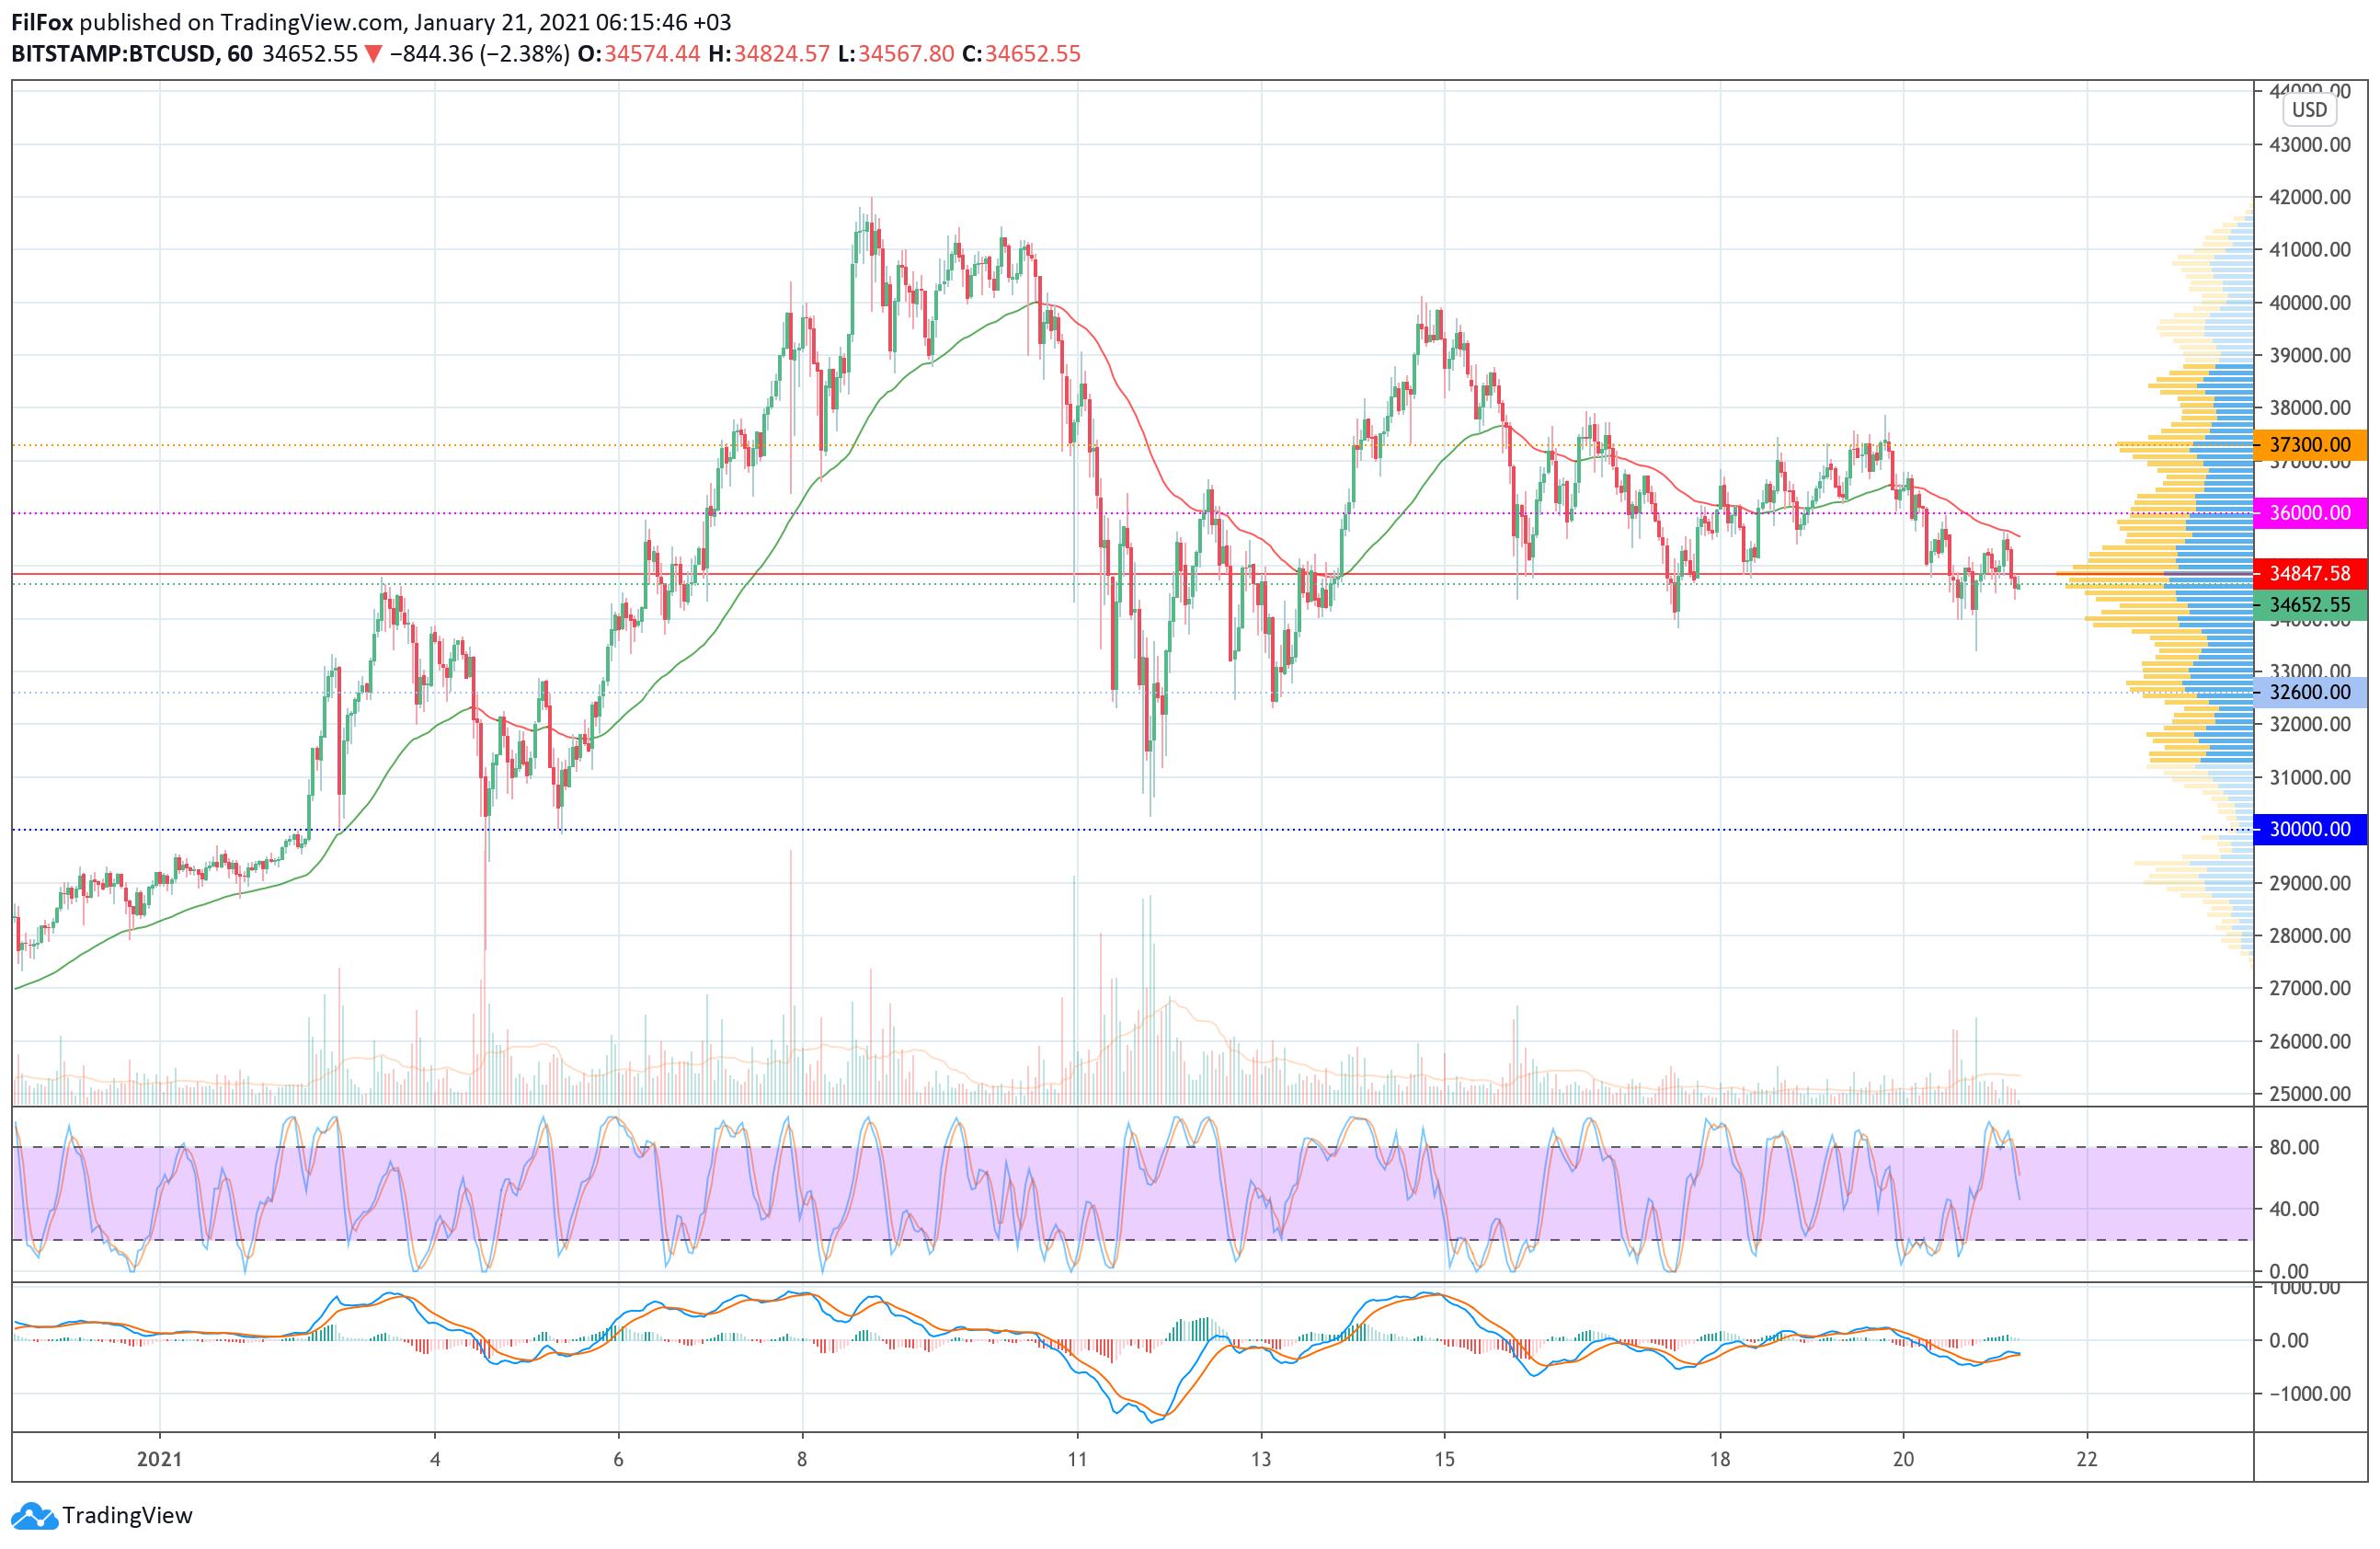 Анализ цен Bitcoin, Ethereum, Ripple на 21.01.2021